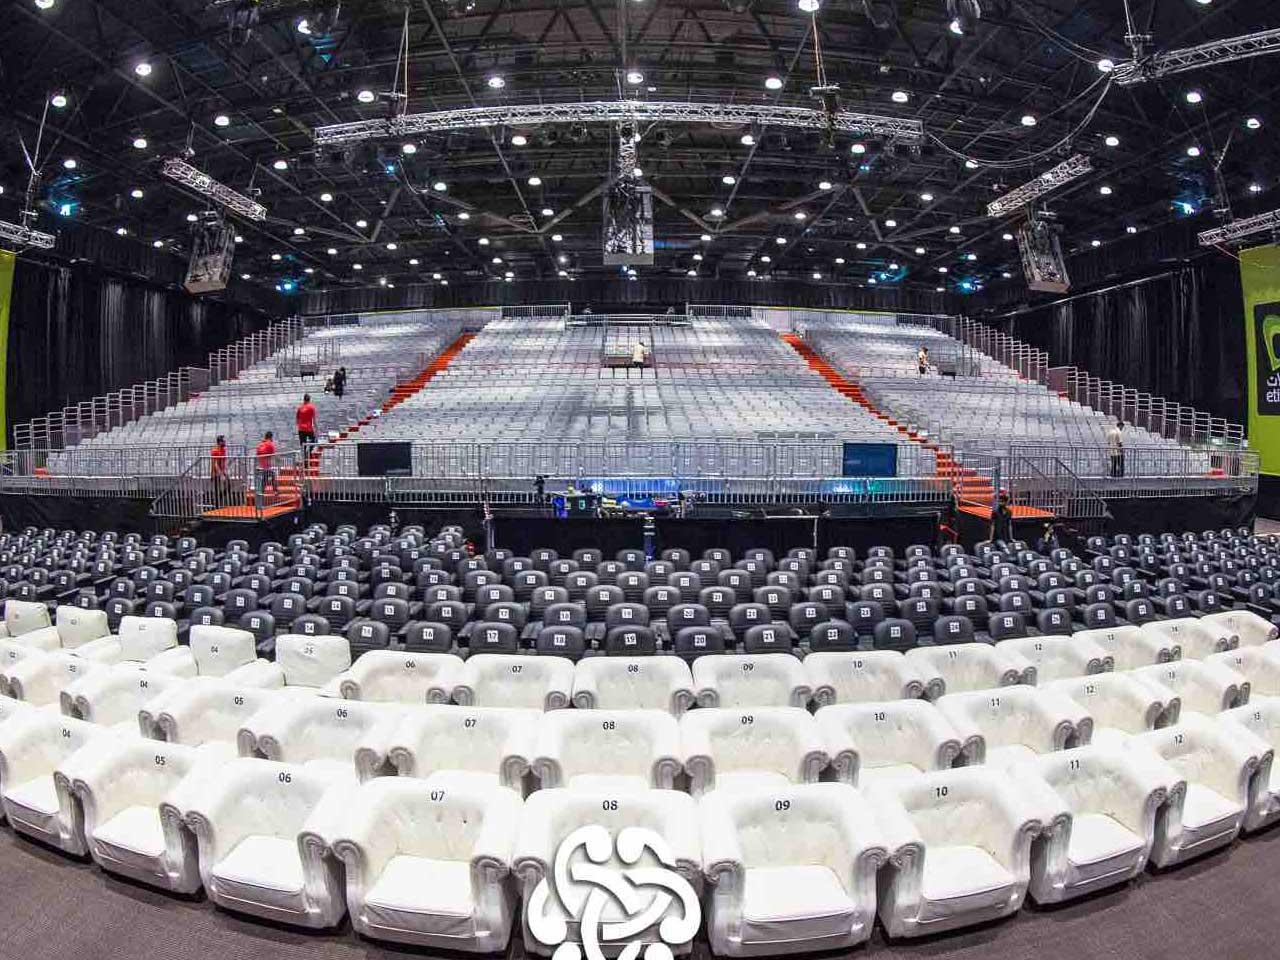 grandstand-seats-events-setup-rental-stadium-seating-sport-management-film-festival-seating-screening-f1-open-air-cinema-13